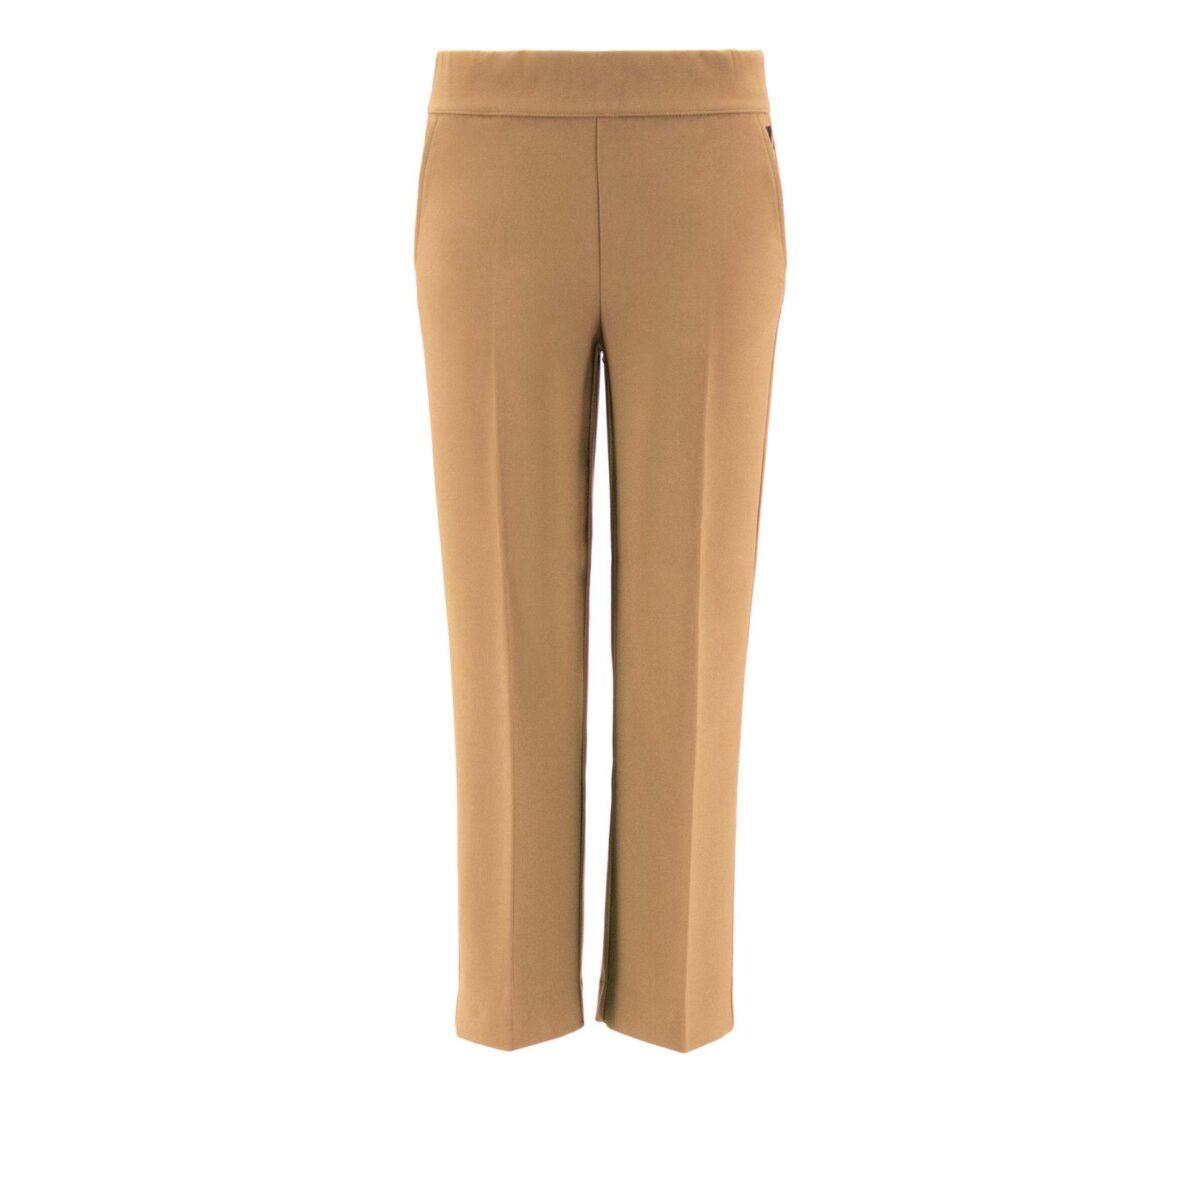 Pantalone Classic NATURALE - vista frontale | Nicla